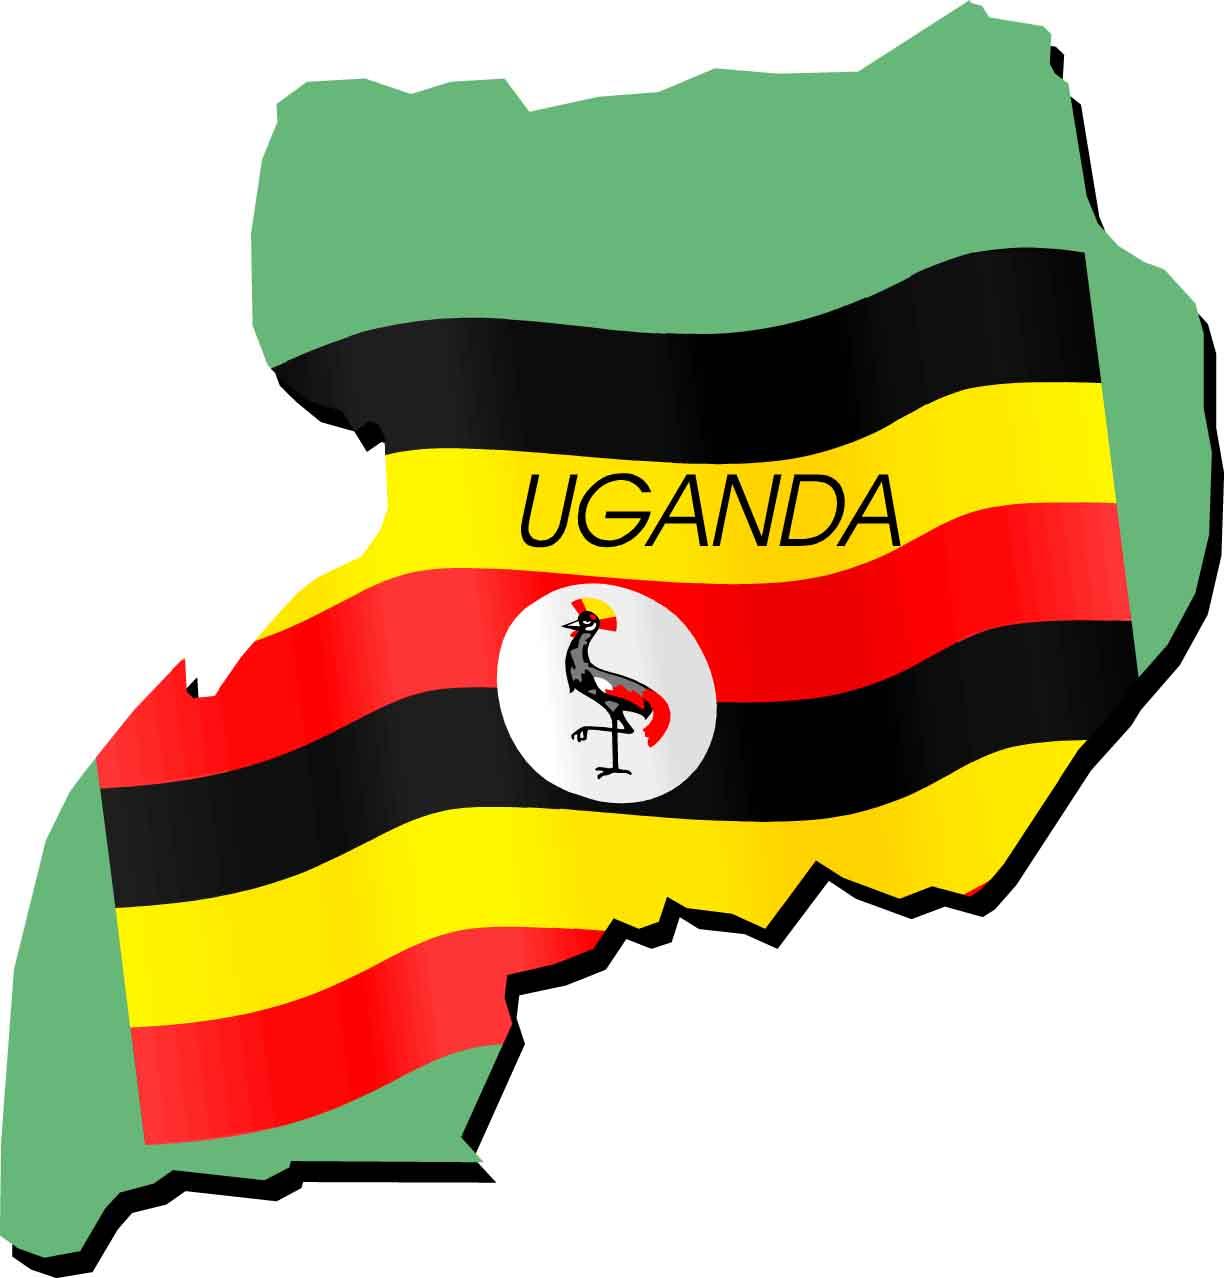 Uganda culture.